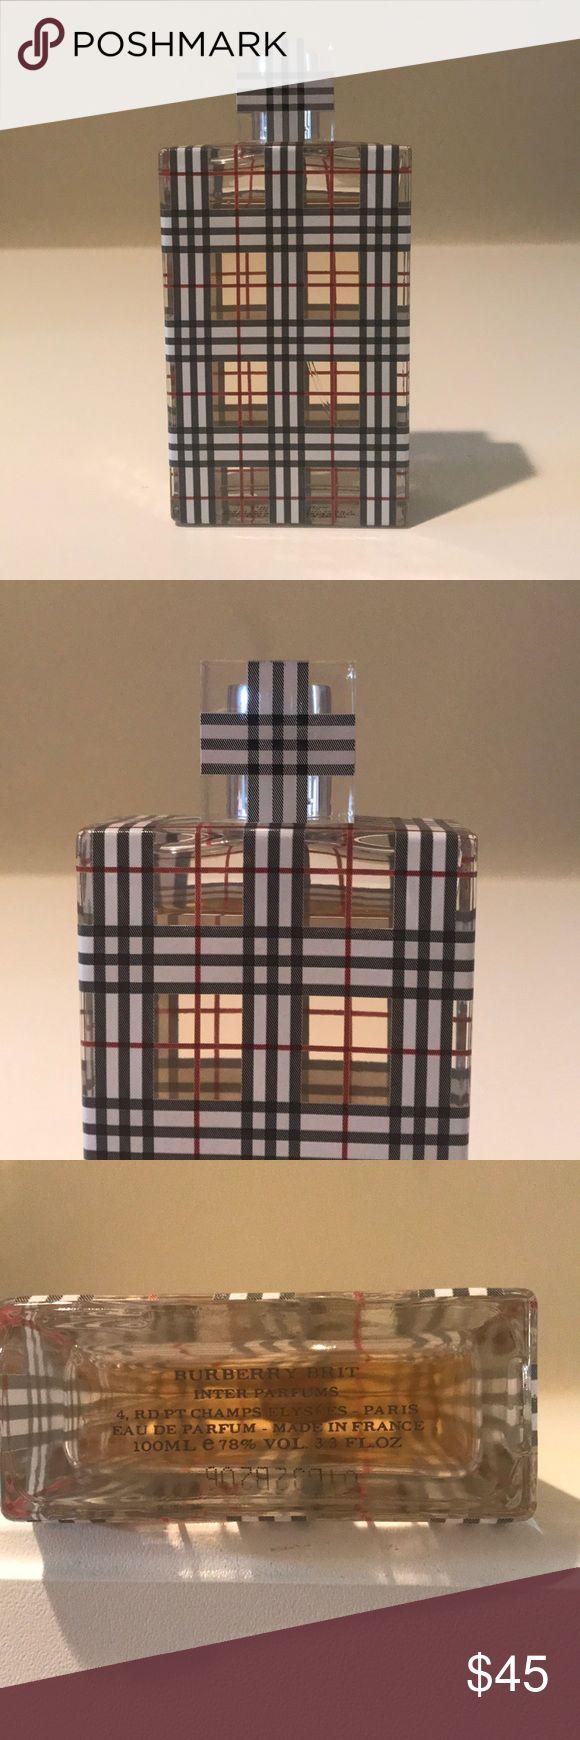 Burberry Brit Inter Perfume 3.3 FL. OZ. Pre owned (bottle still full) Burberry Brit perfume 3.3 FL. OZ. Burberry Makeup